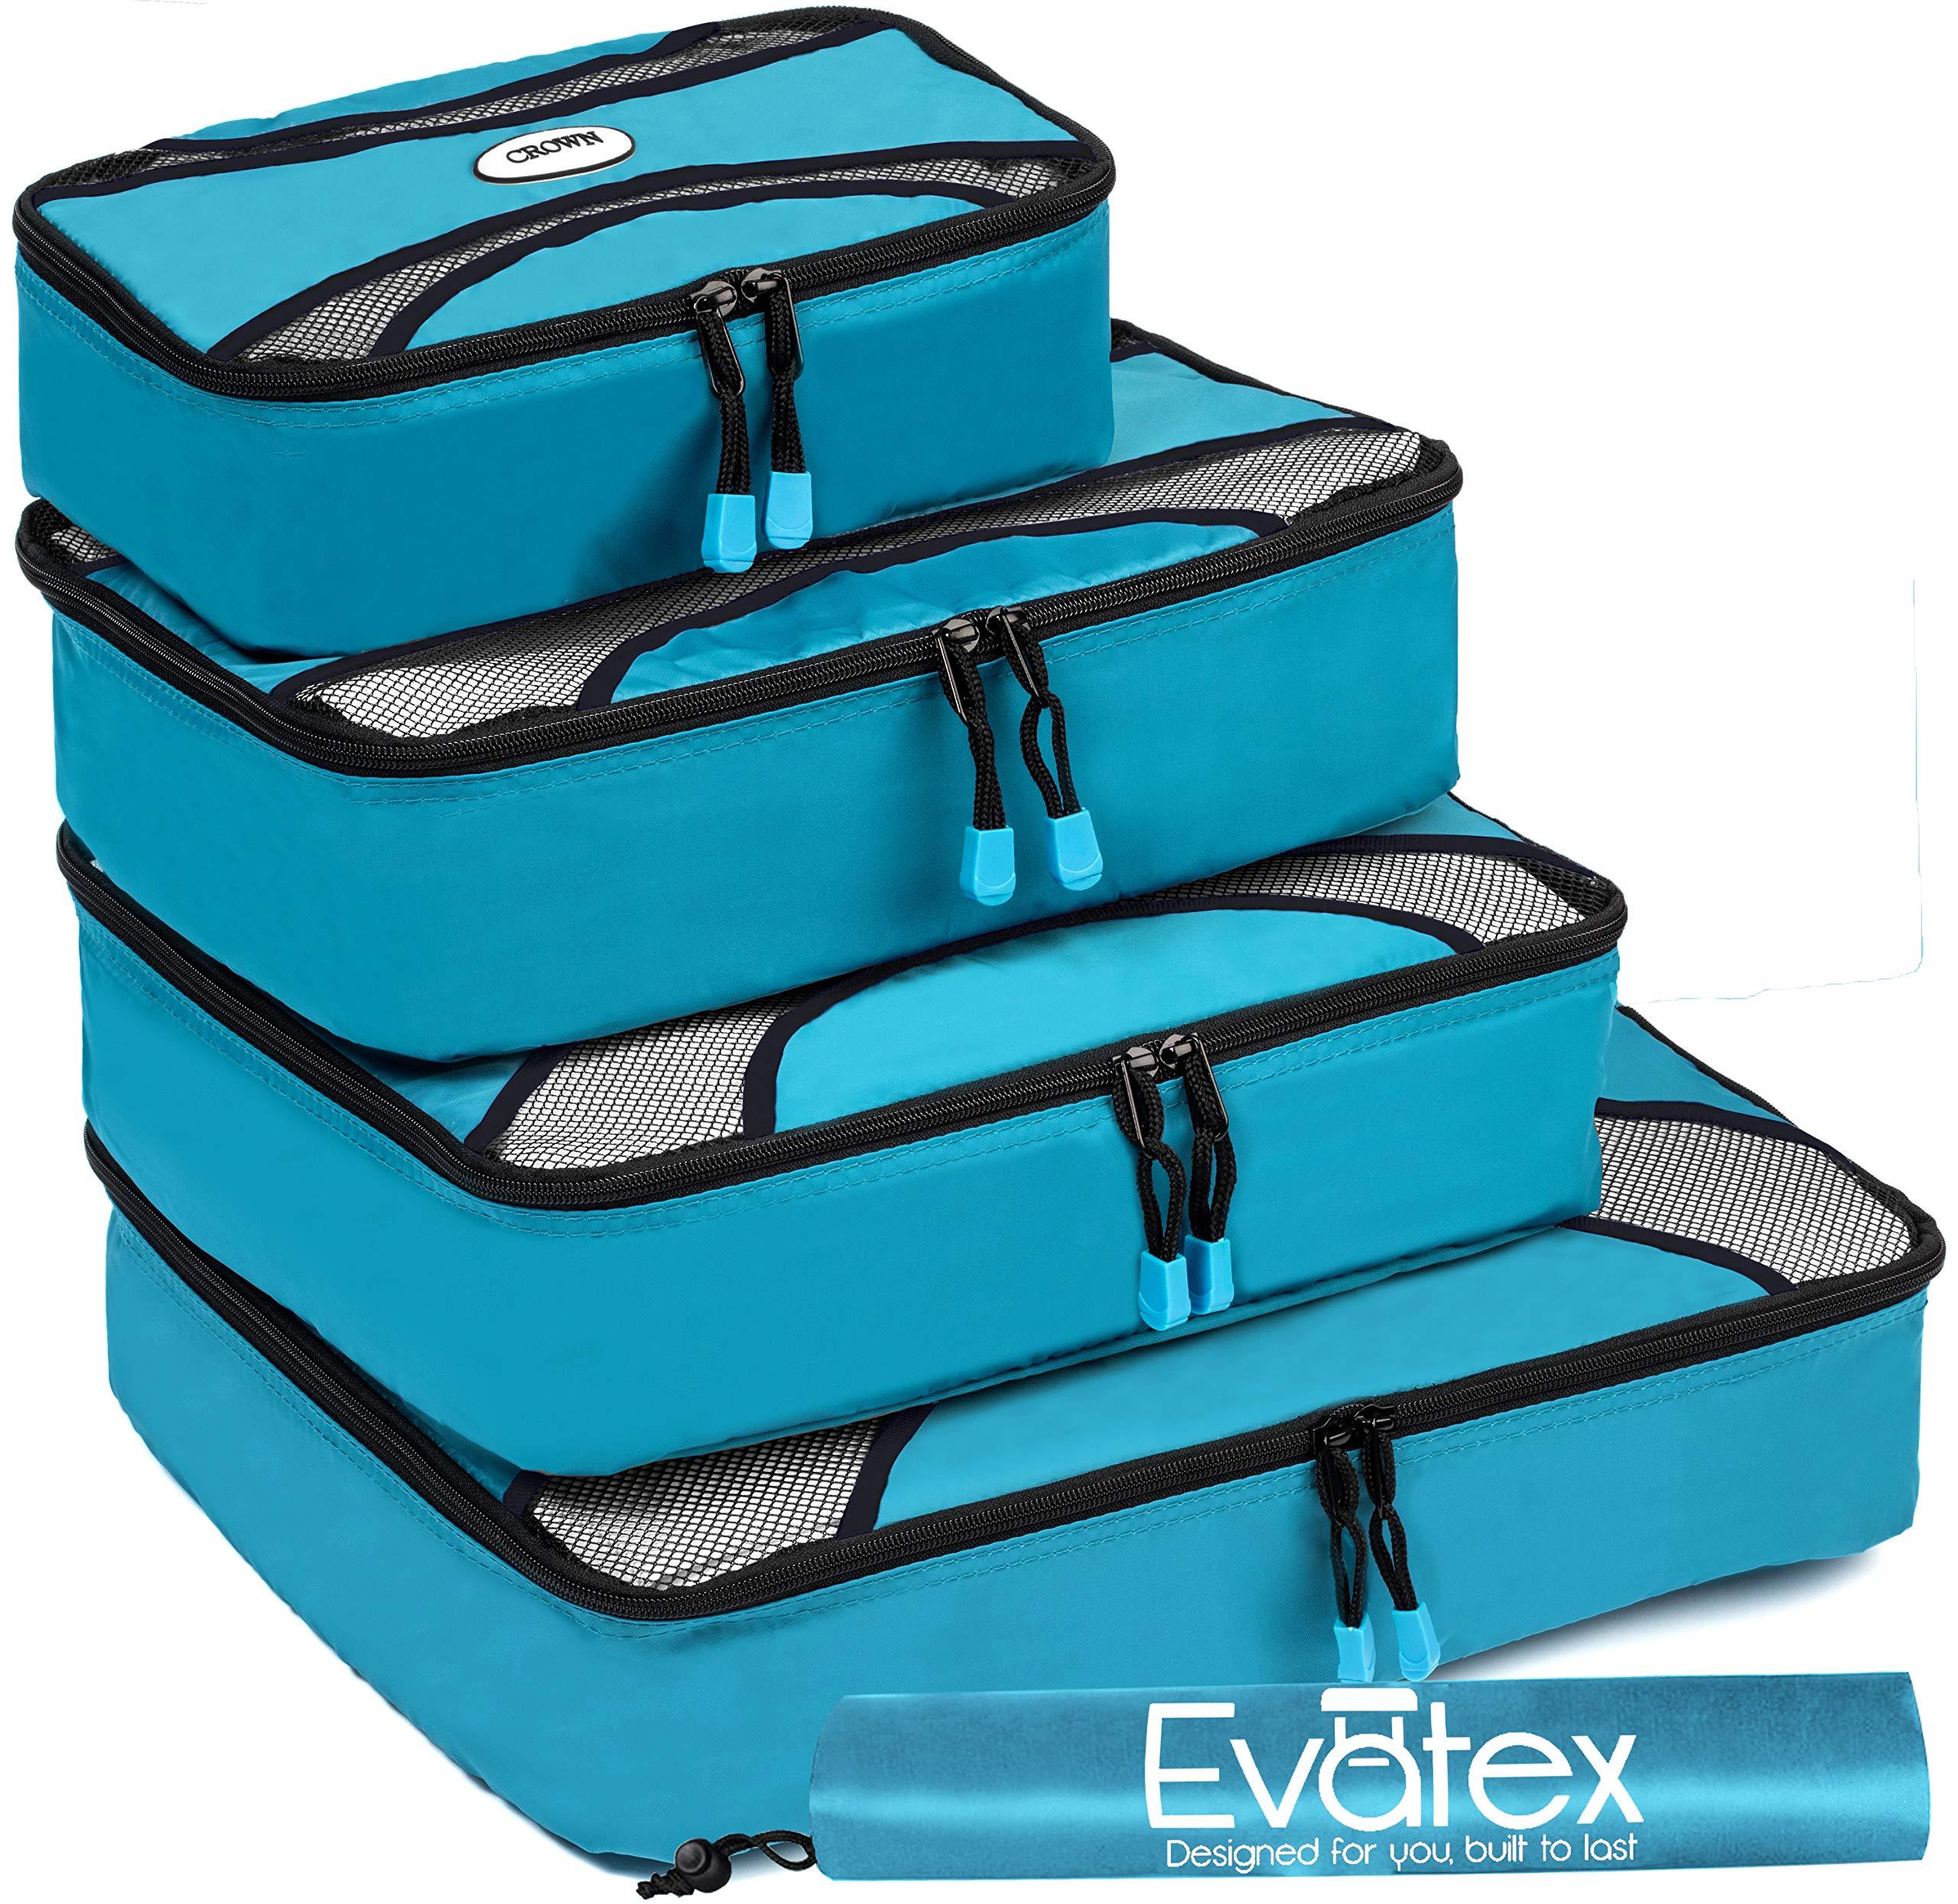 Evatex Packing Cubes   Travel Packing Cubes, 6pc Set with Shoe Bag  Laundry Bag (Marine Blue) product image